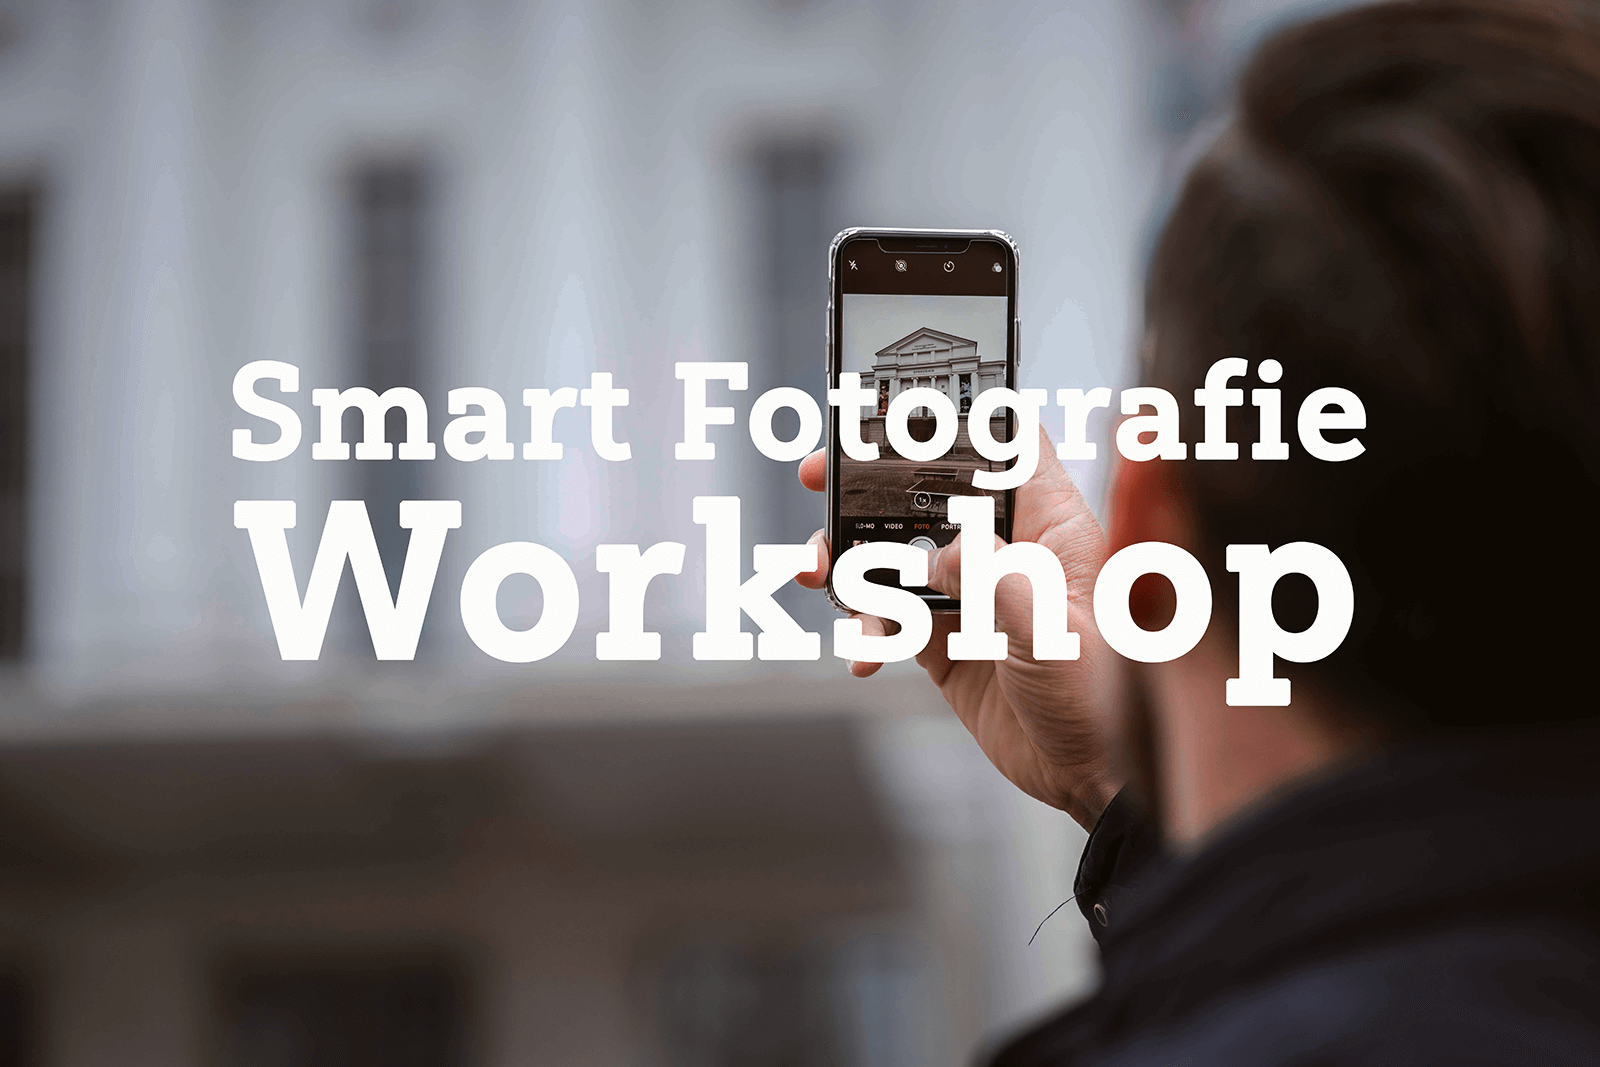 smartfotografieren_web-2